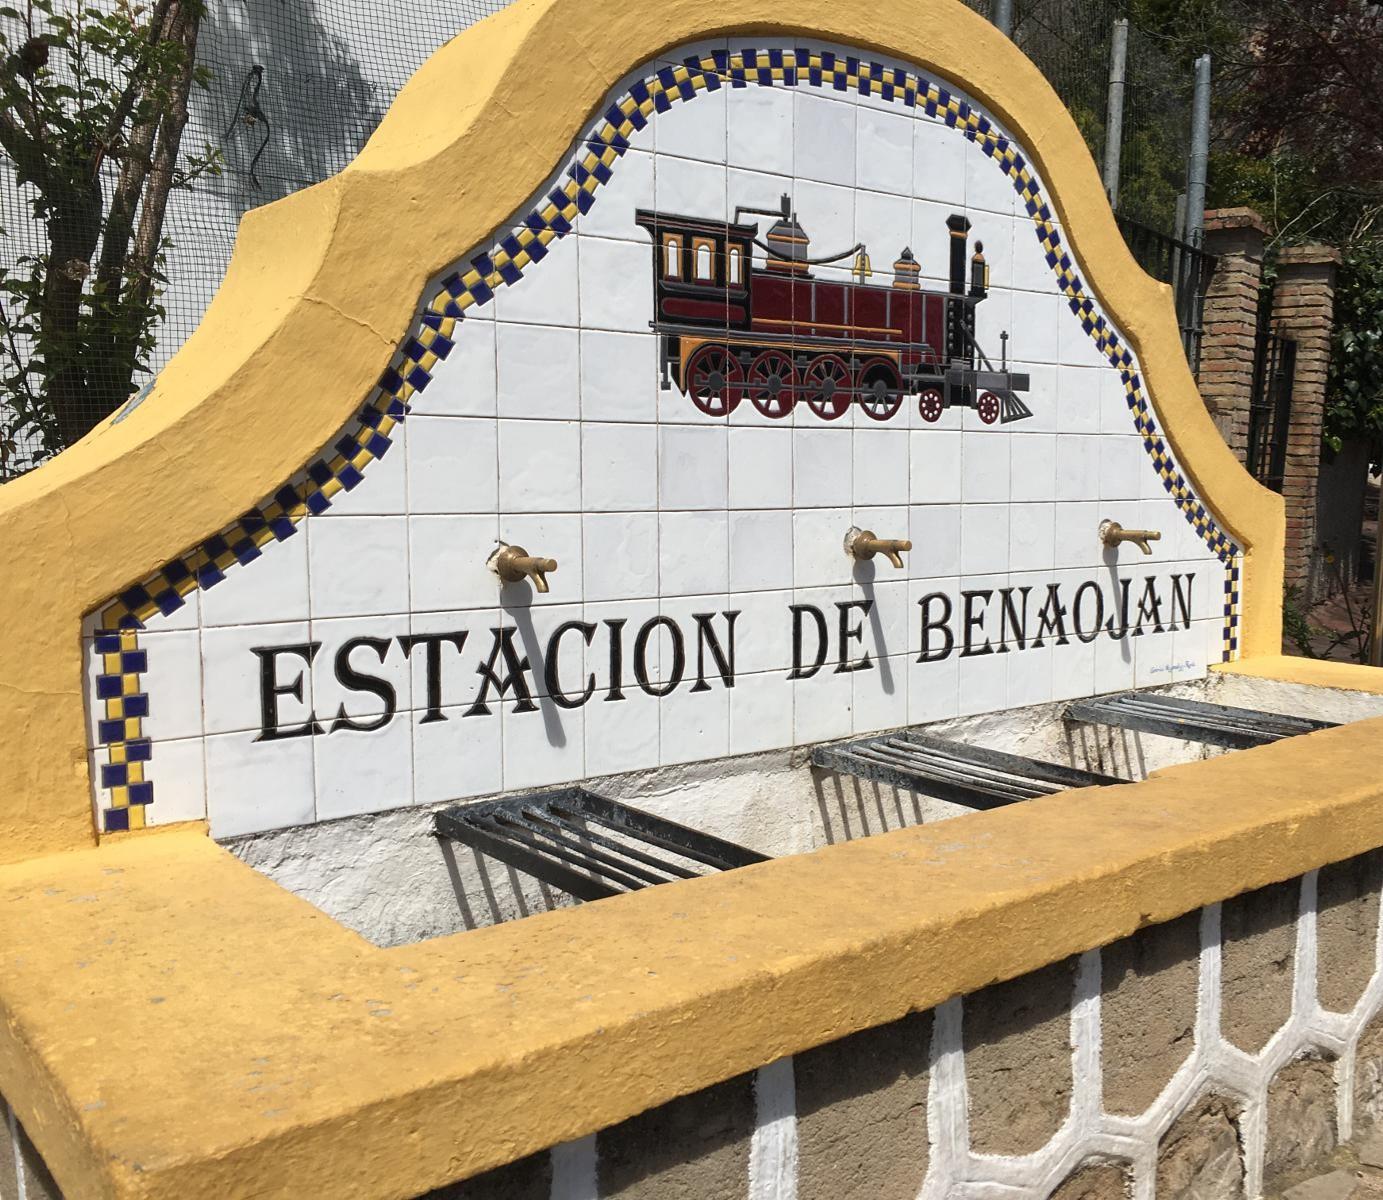 benaojan_train_station.jpg